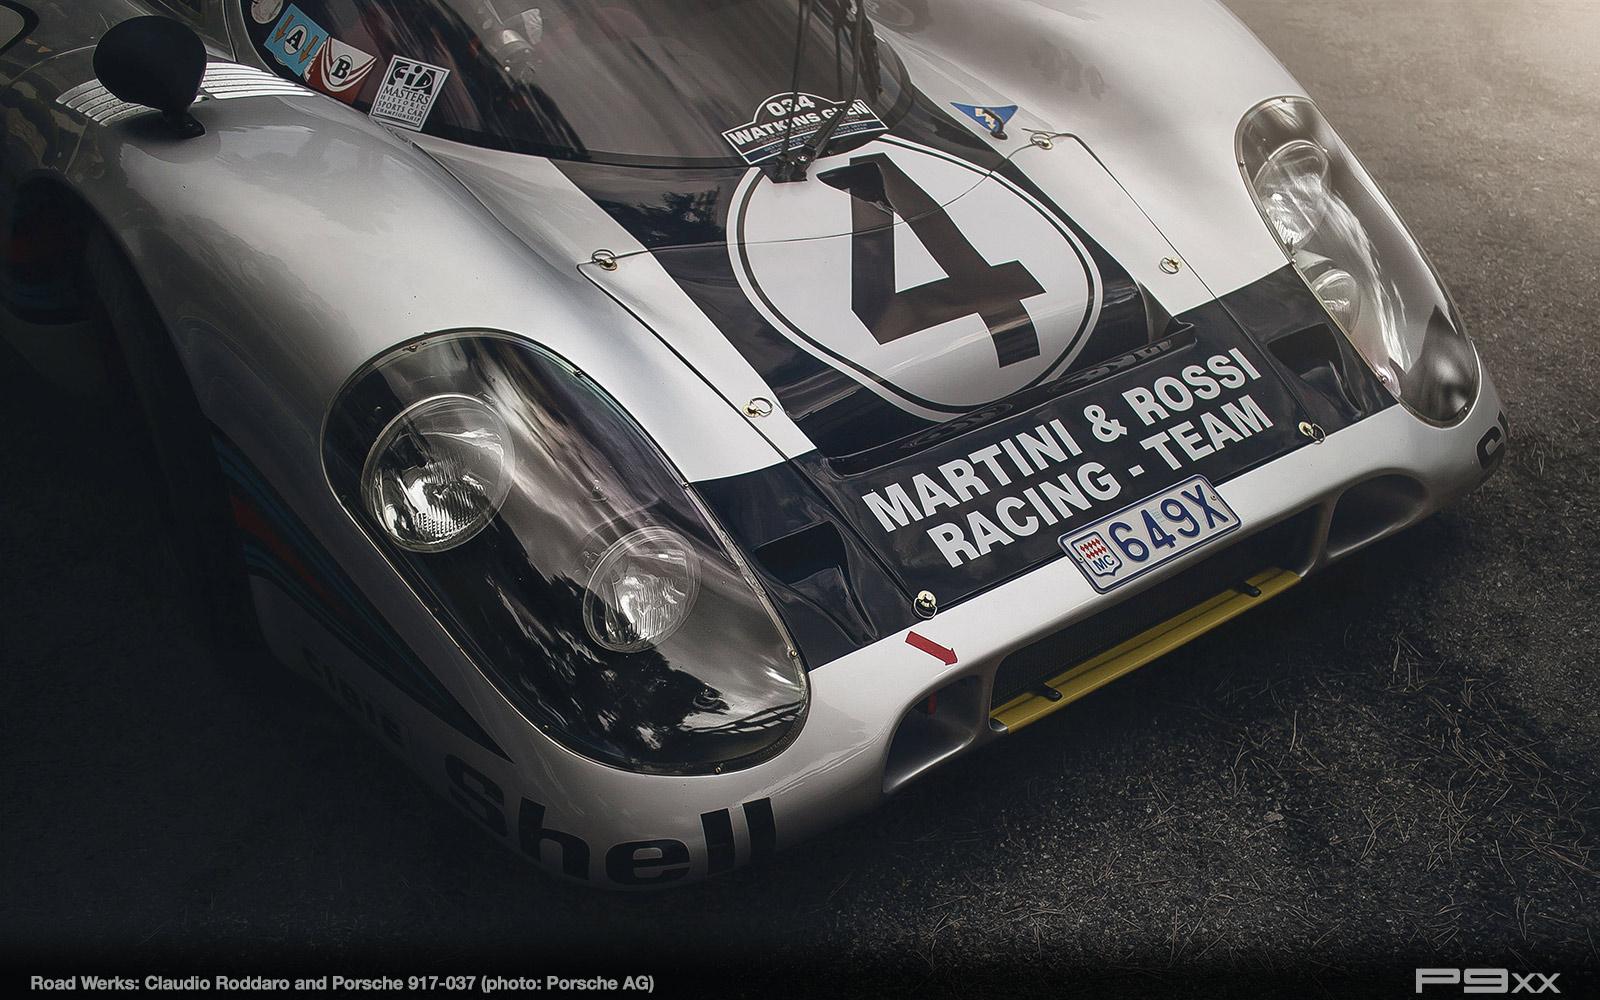 Porsche-917-037-Martini-Racing-Monaco-2018-302